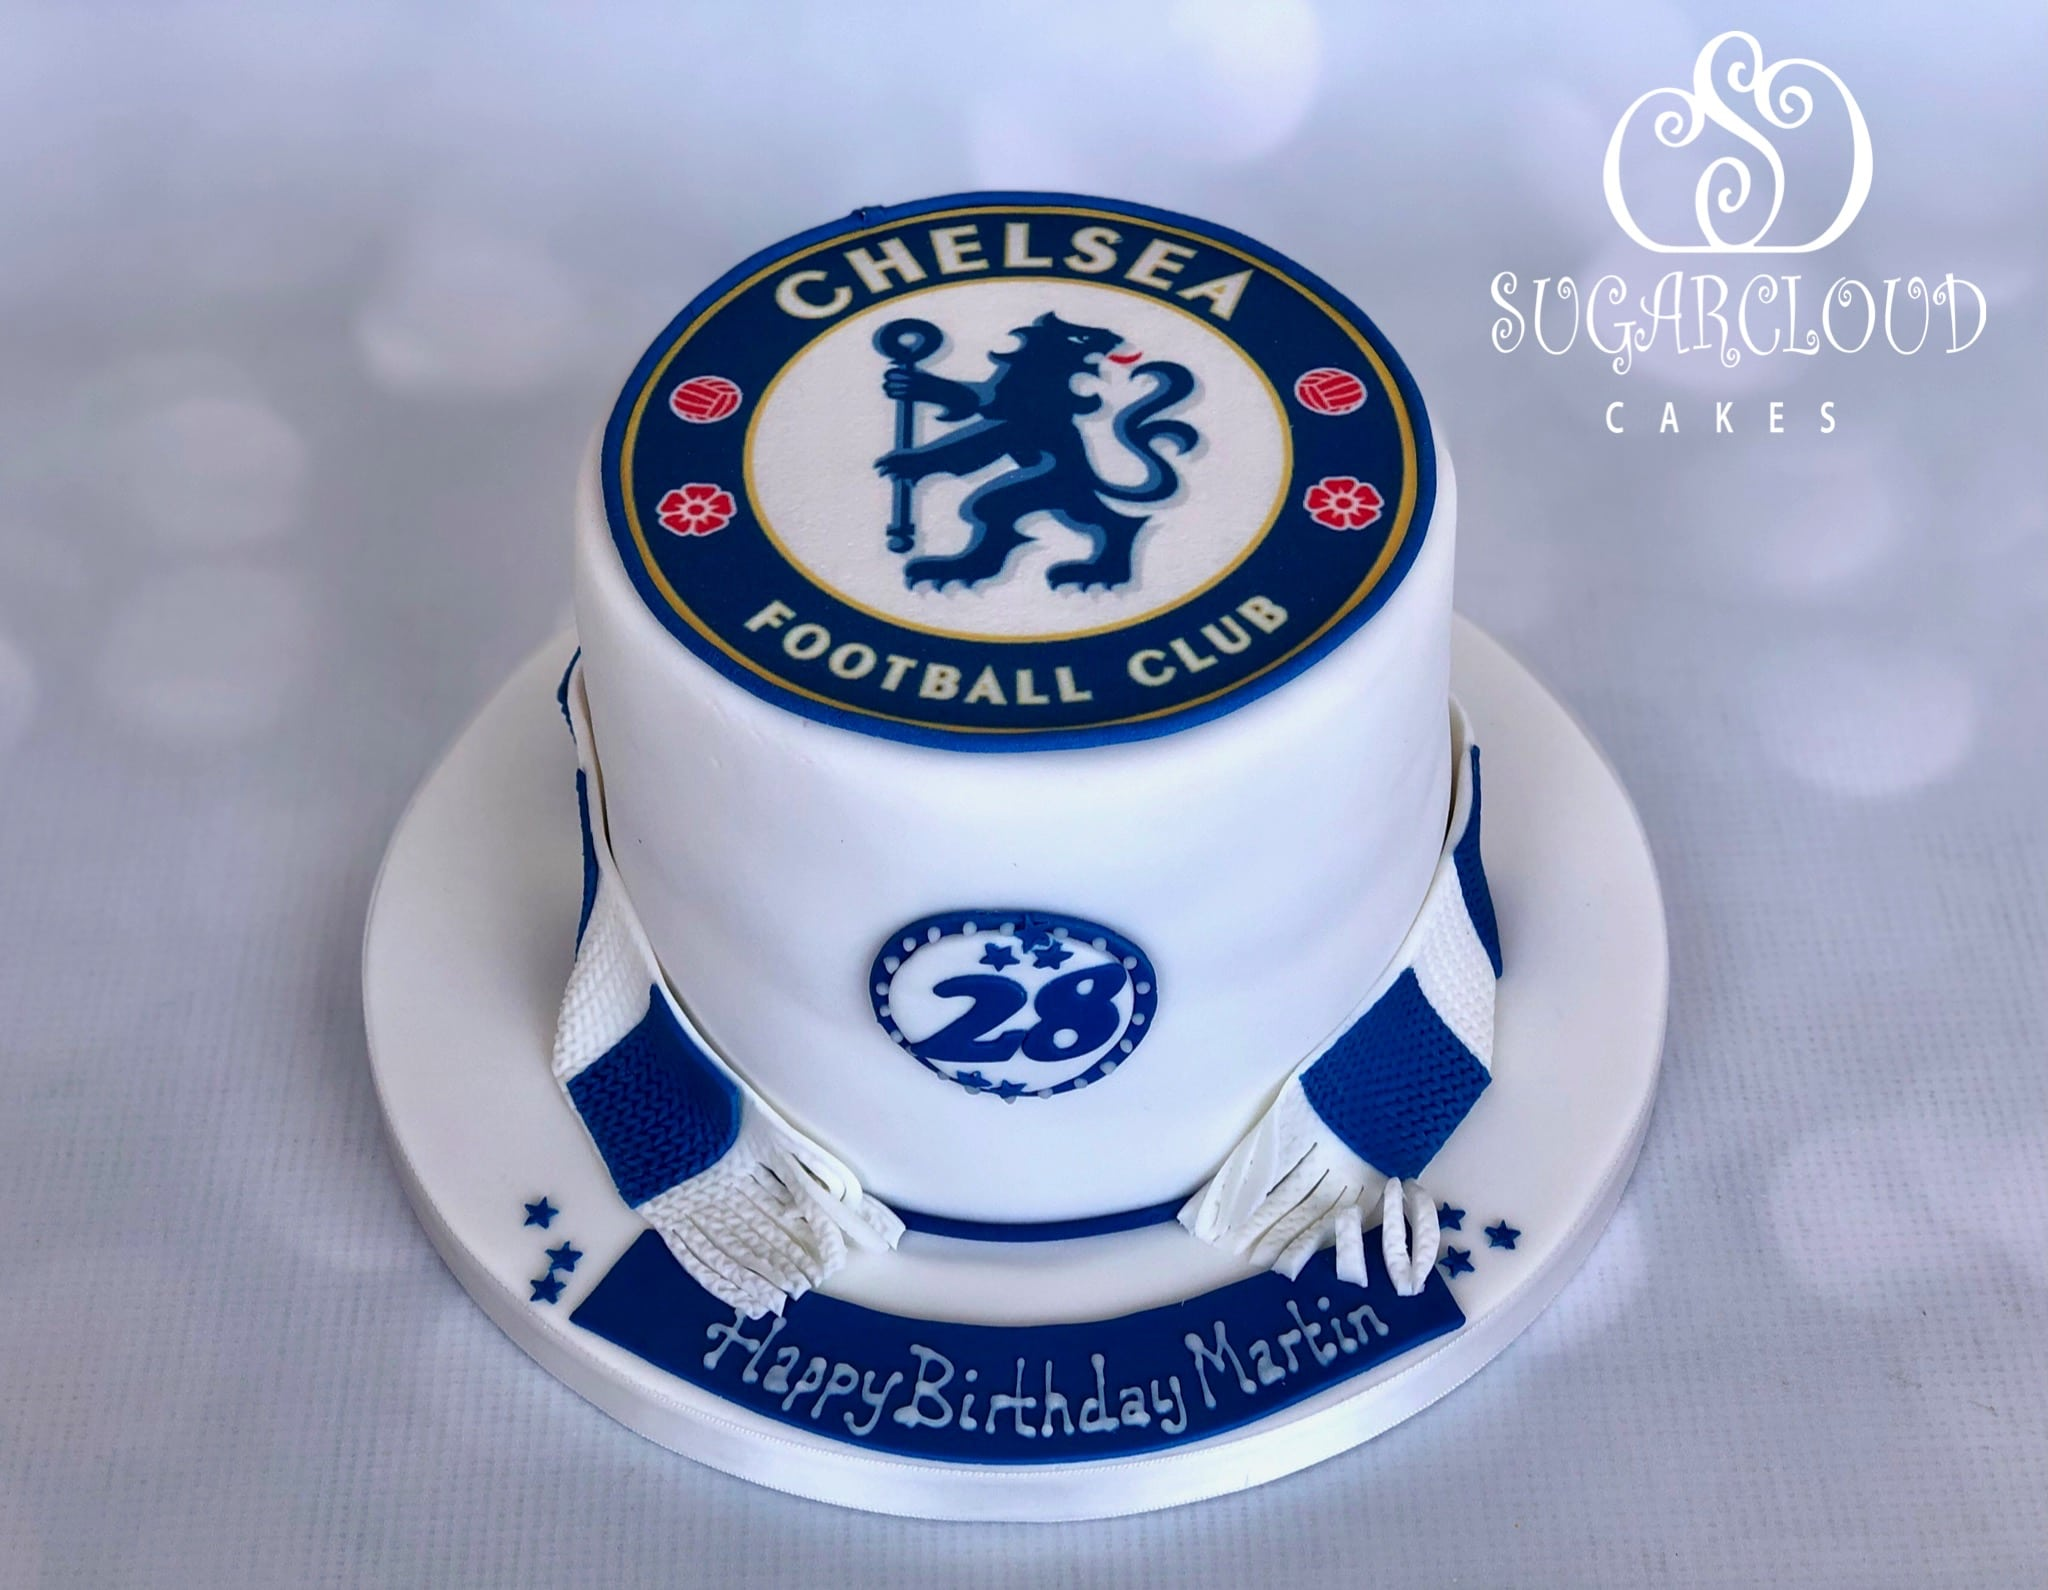 Chelsea Football Club Birthday Cake